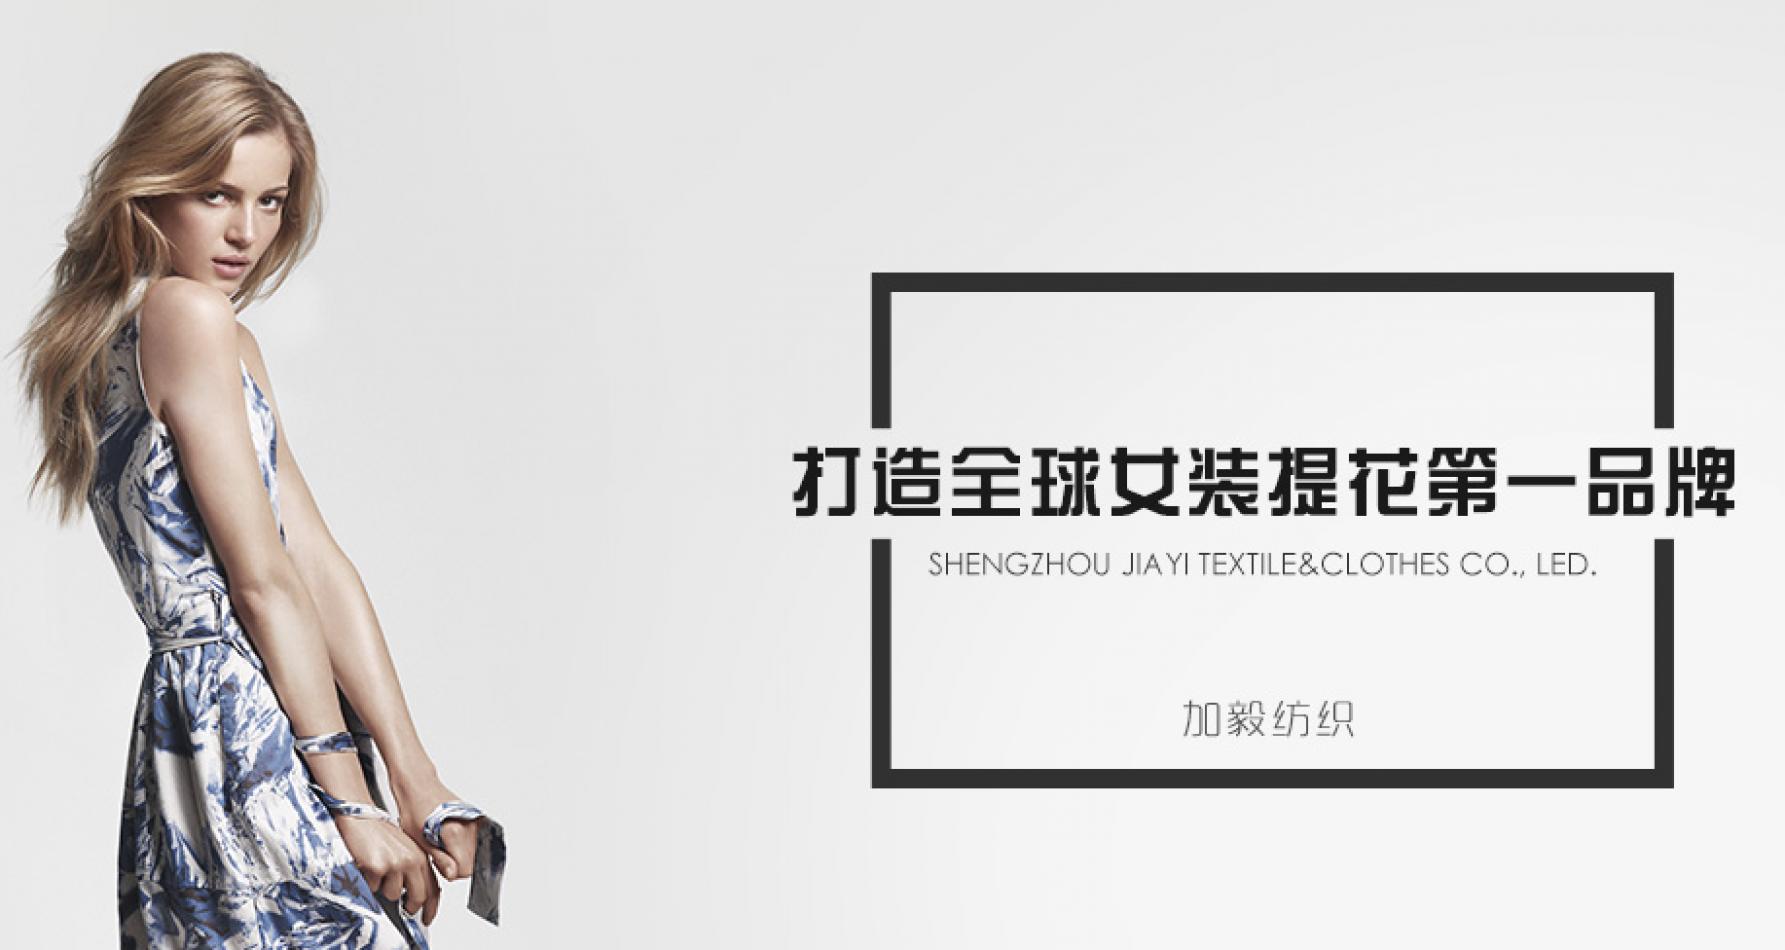 SHENGZHOU JIAYI TEXTILES & CLOTHES CO., LTD.